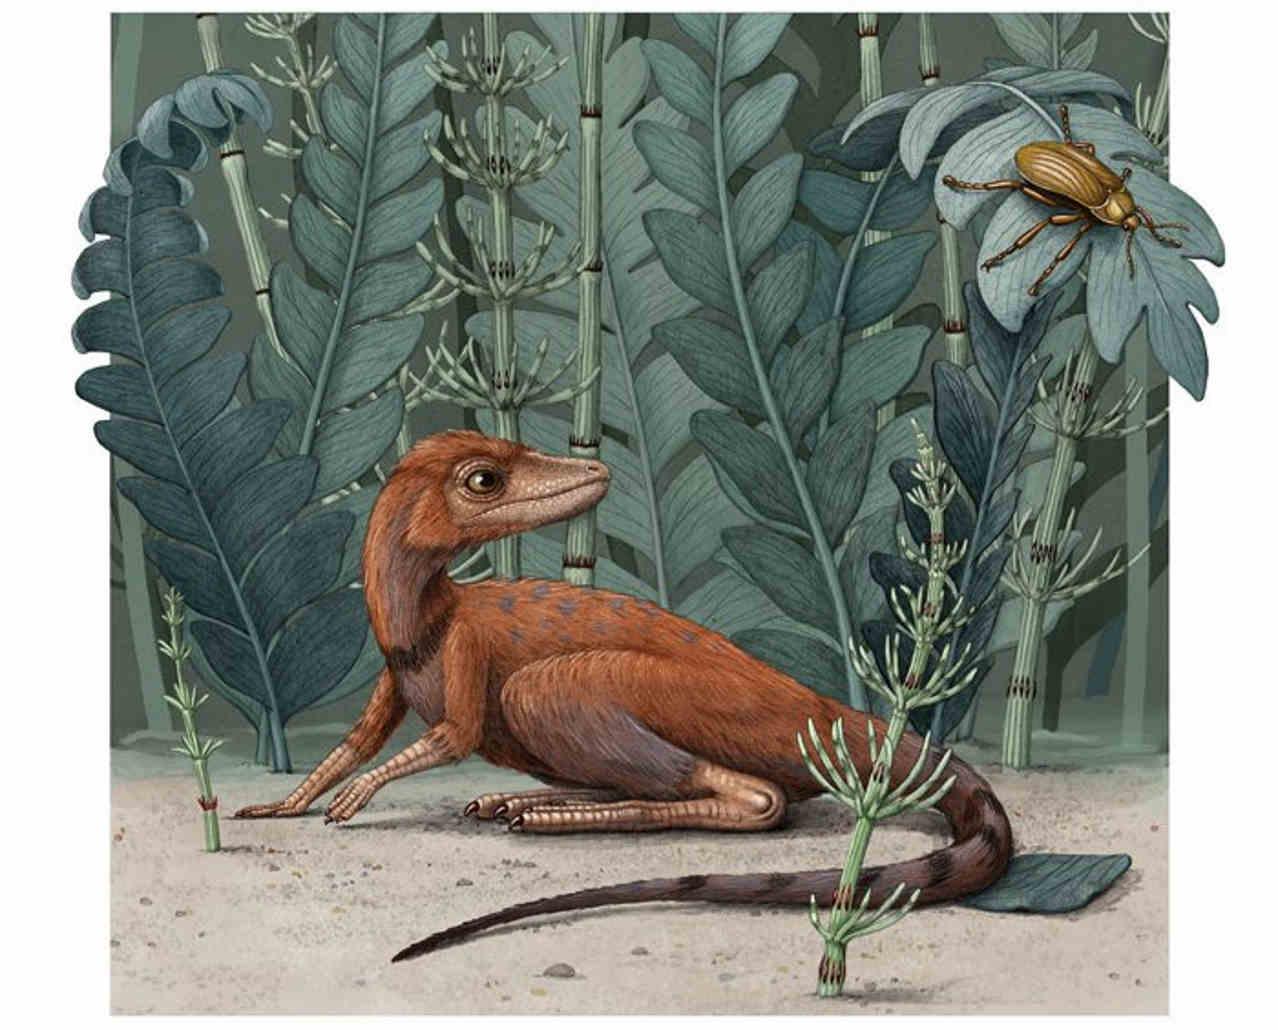 Kongonaphon kely / ©Alex Boersma, American Museum of Natural History